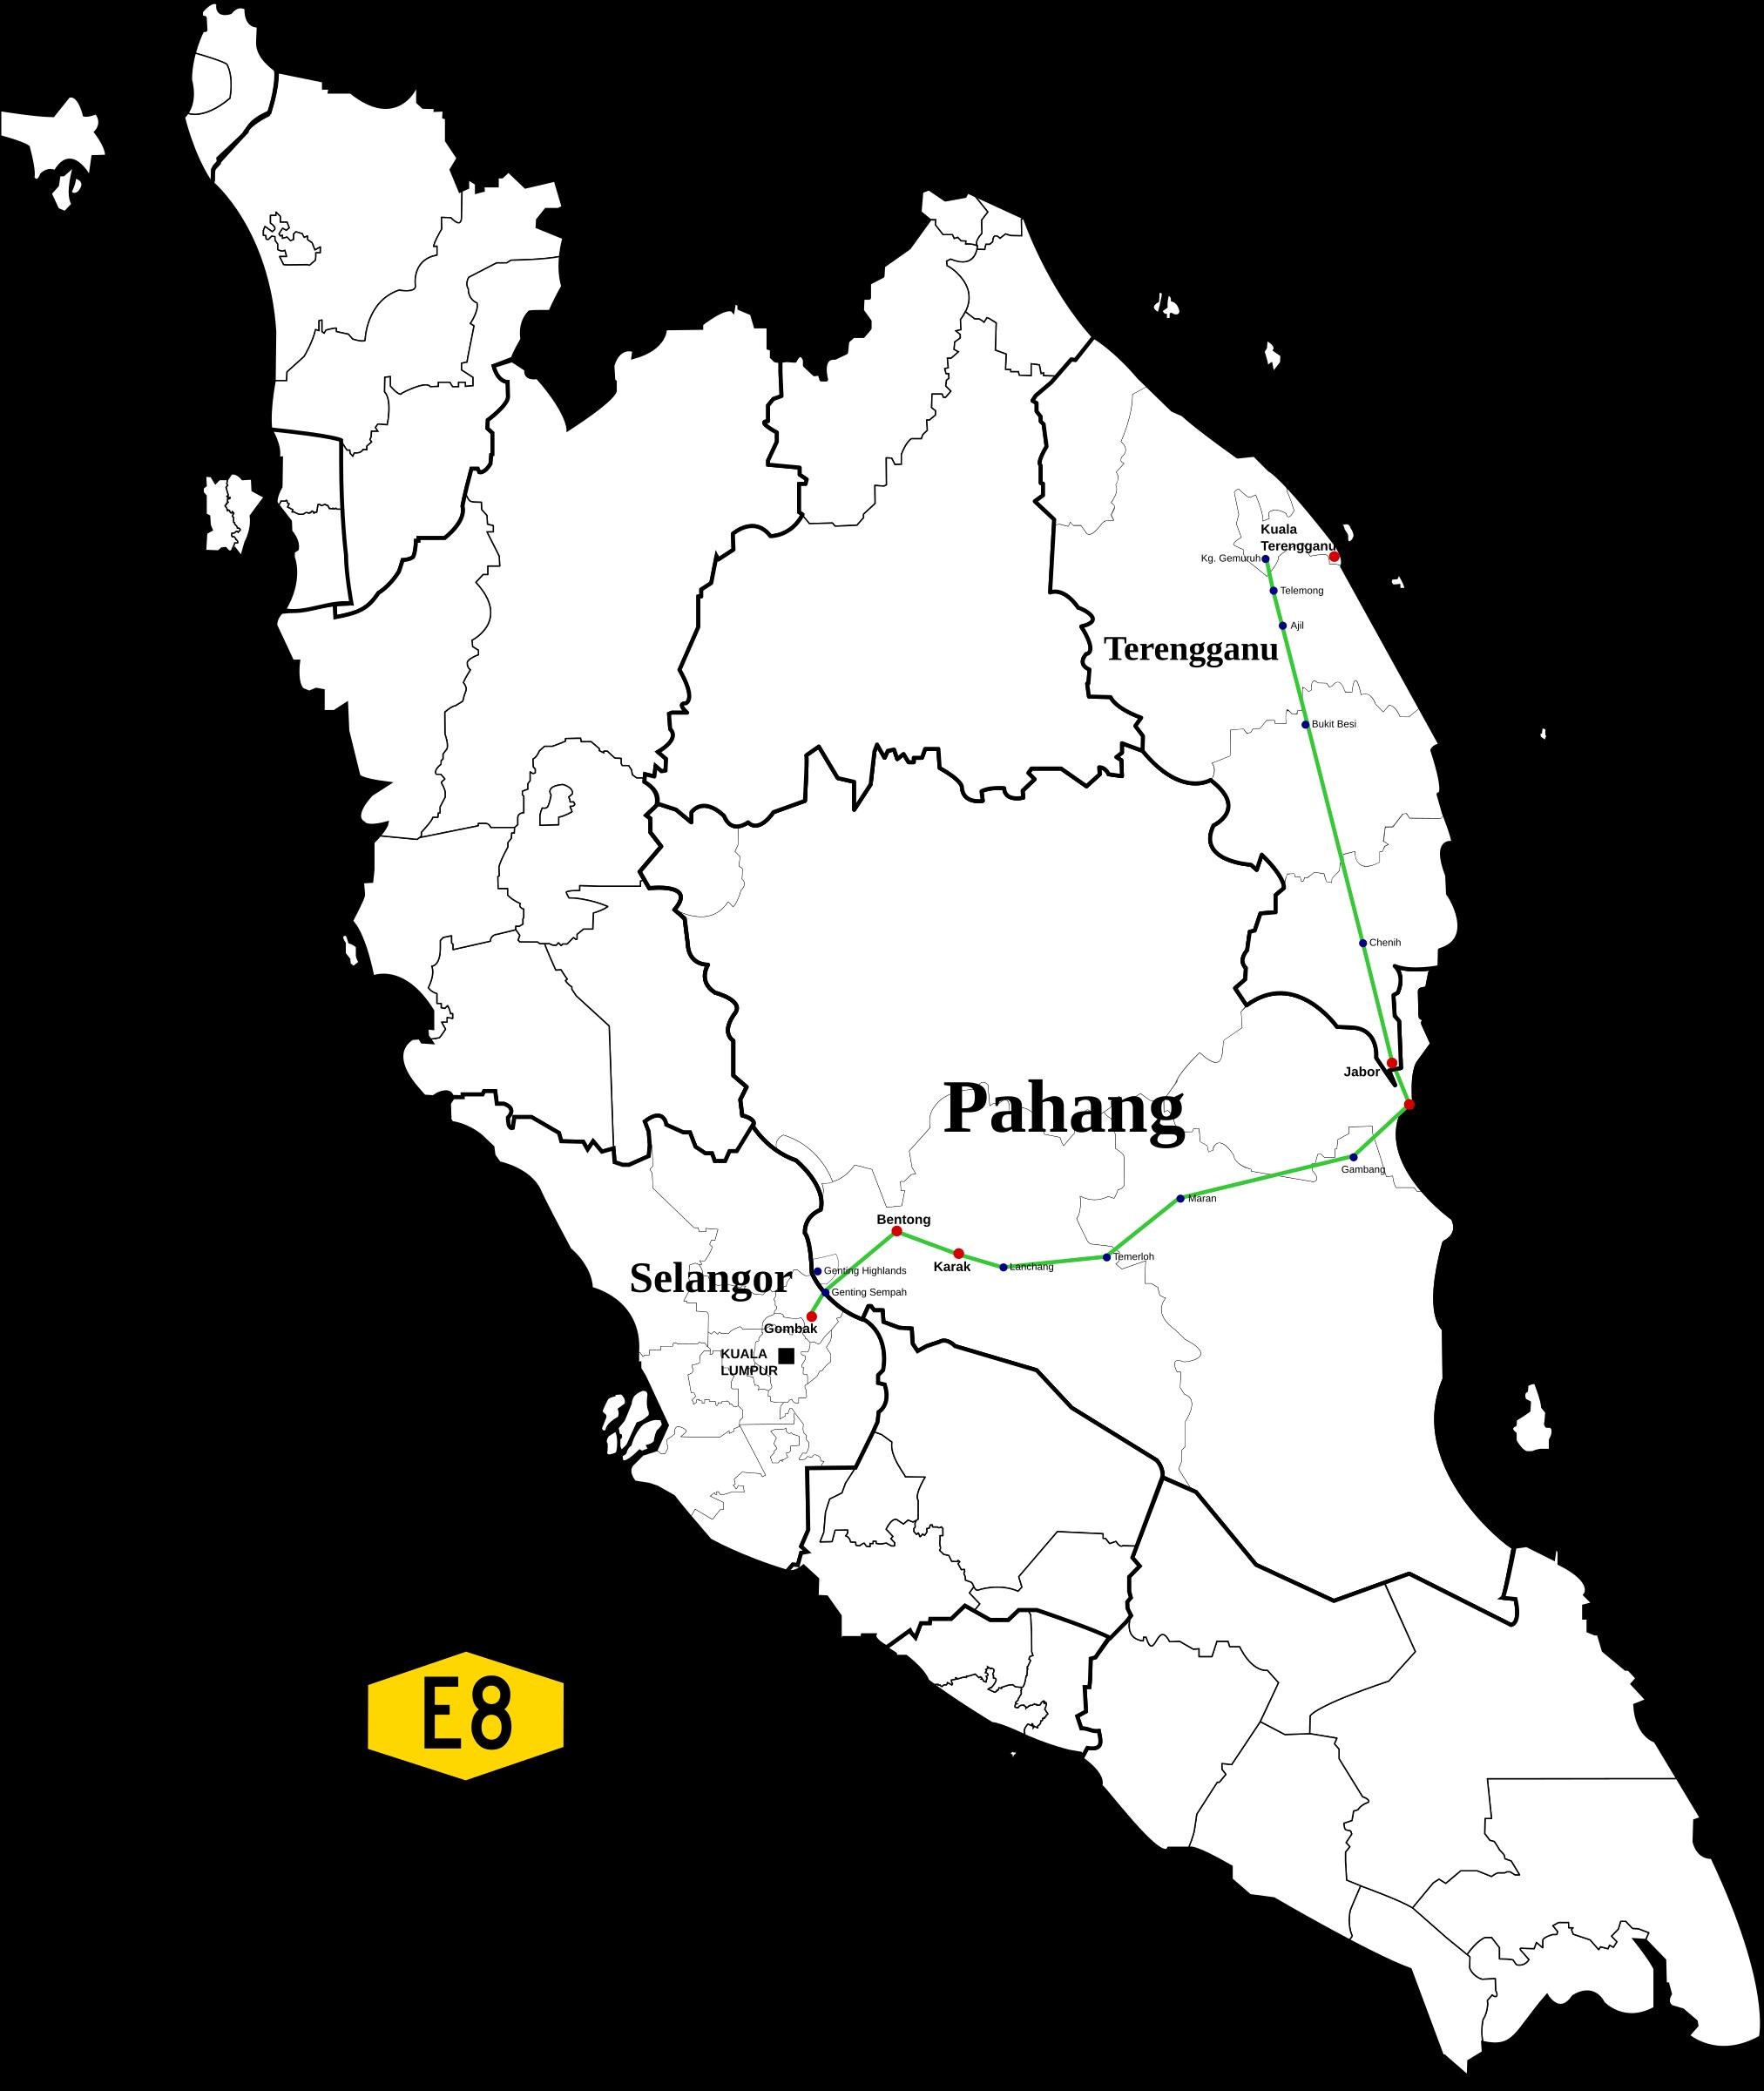 Highway clipart expressway. East coast malaysia big